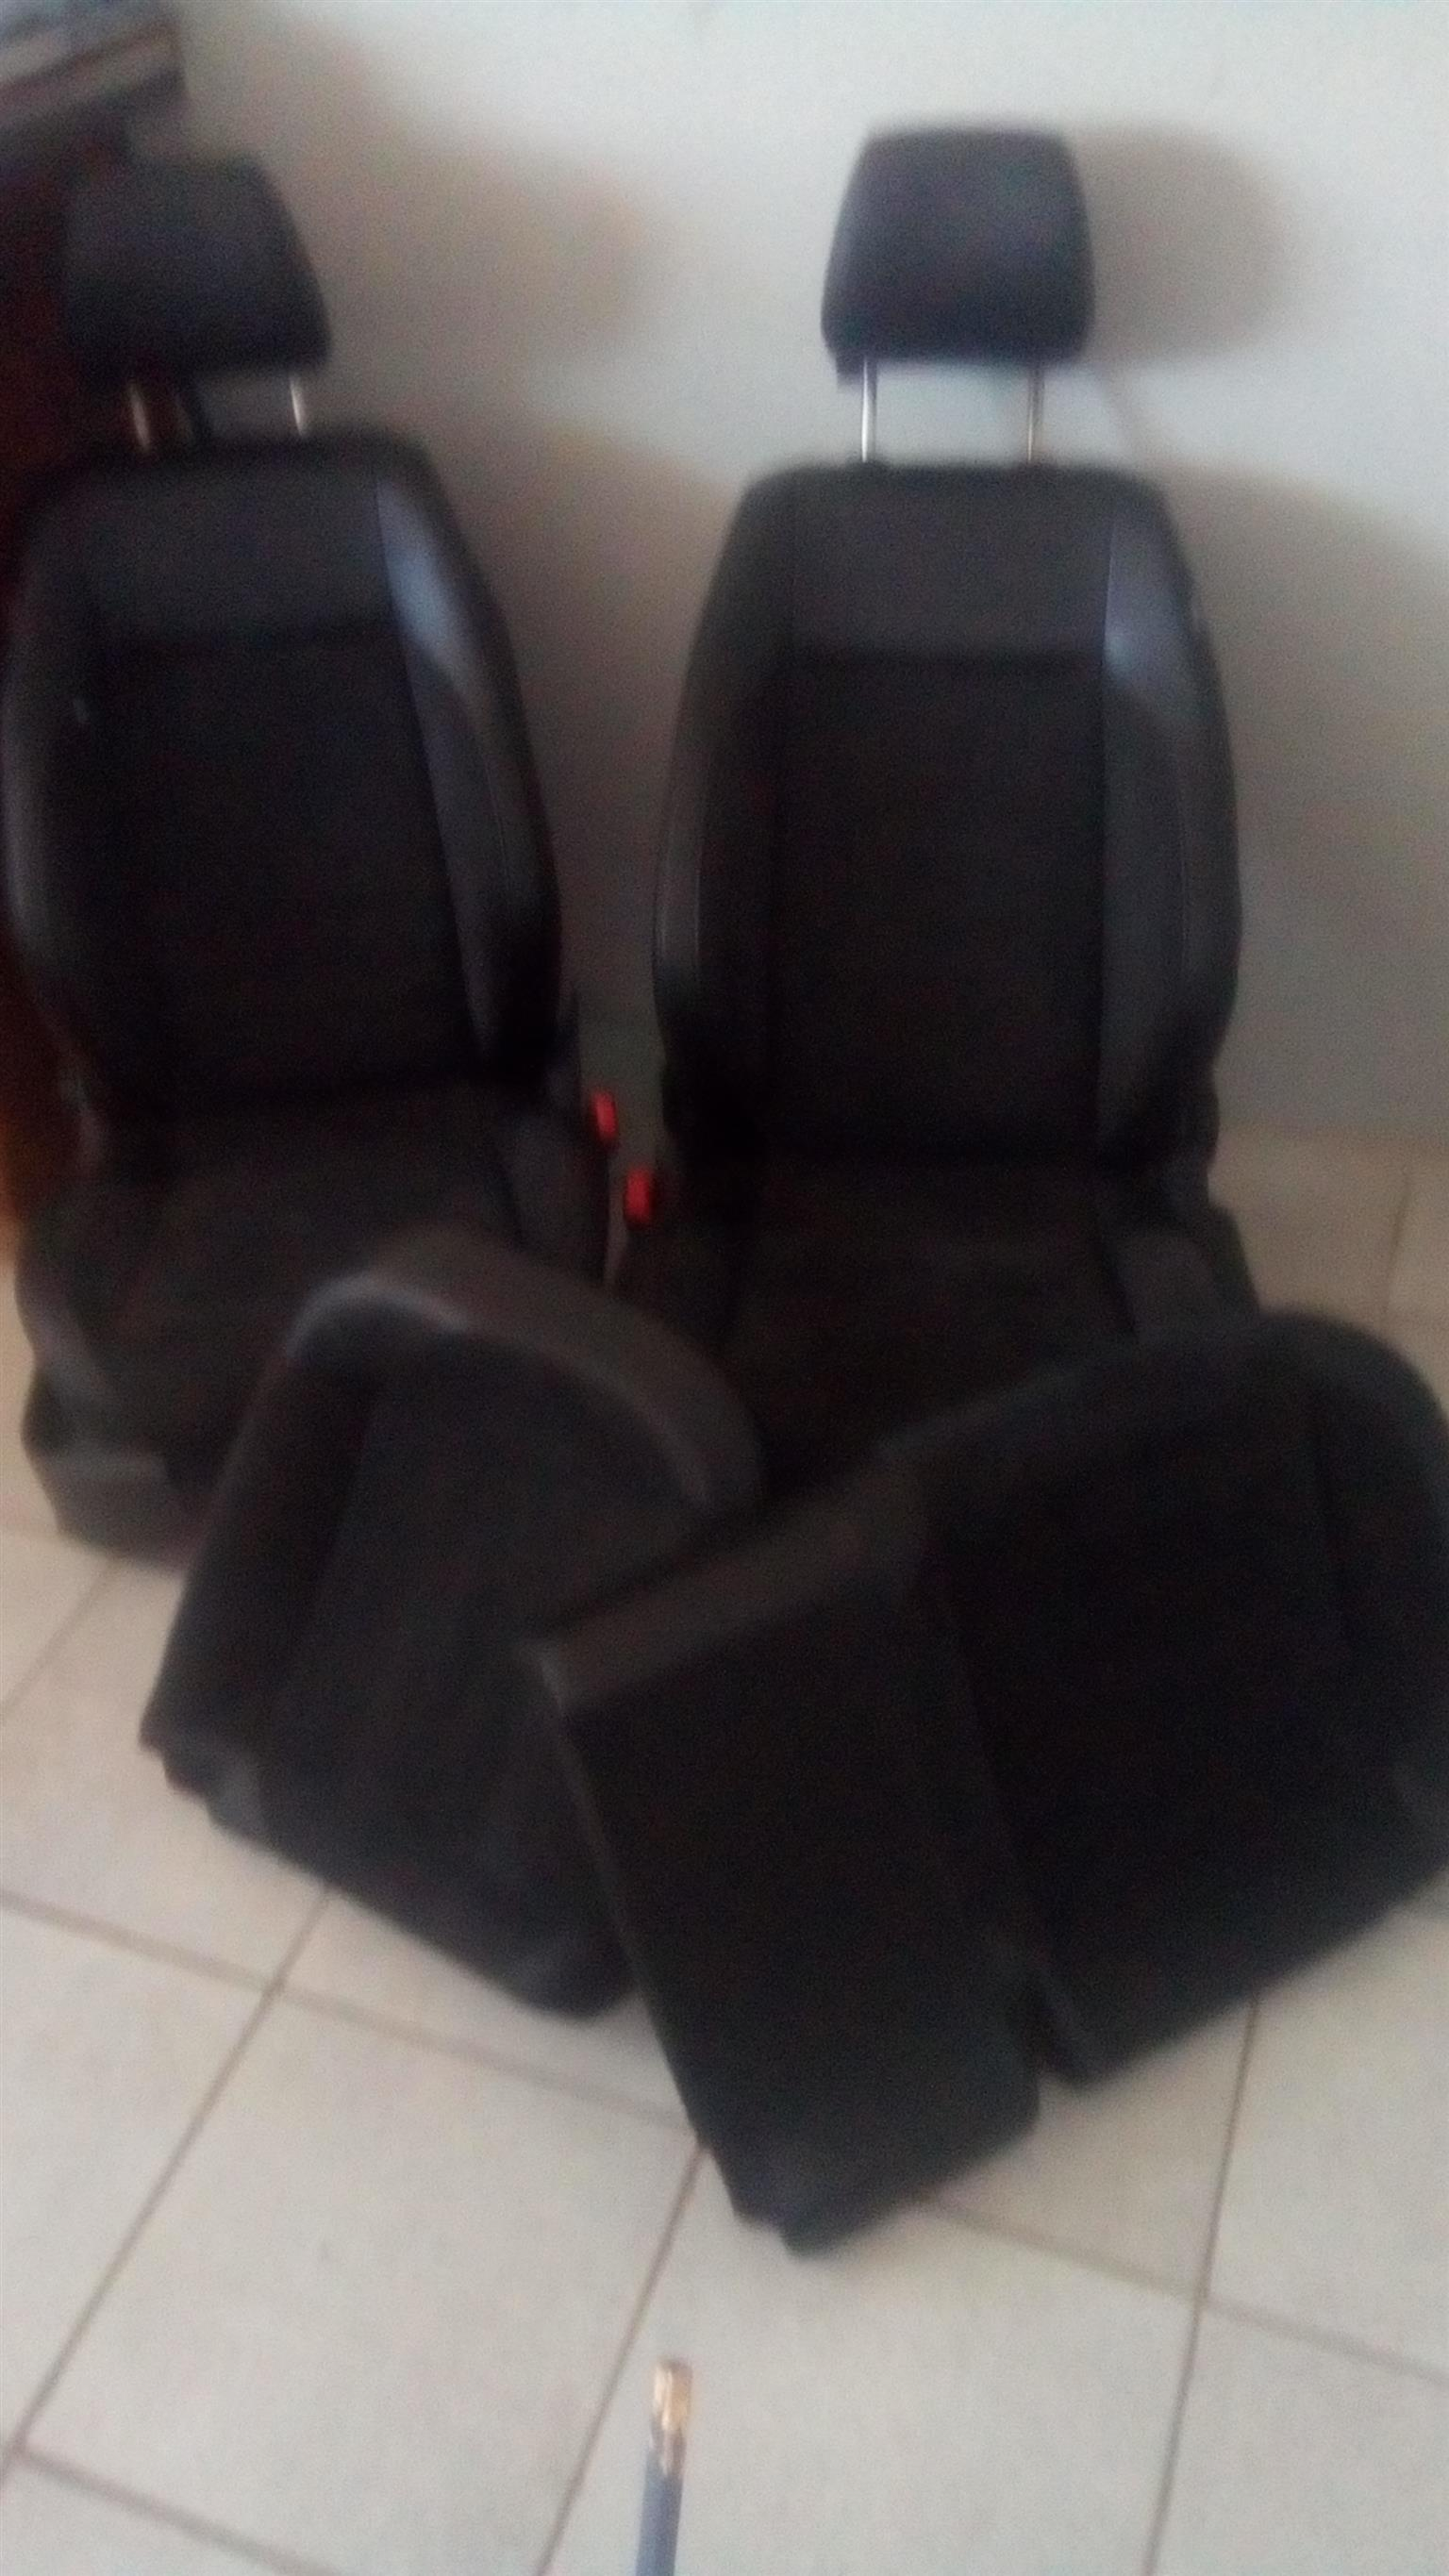 Polo GTI (car seats)